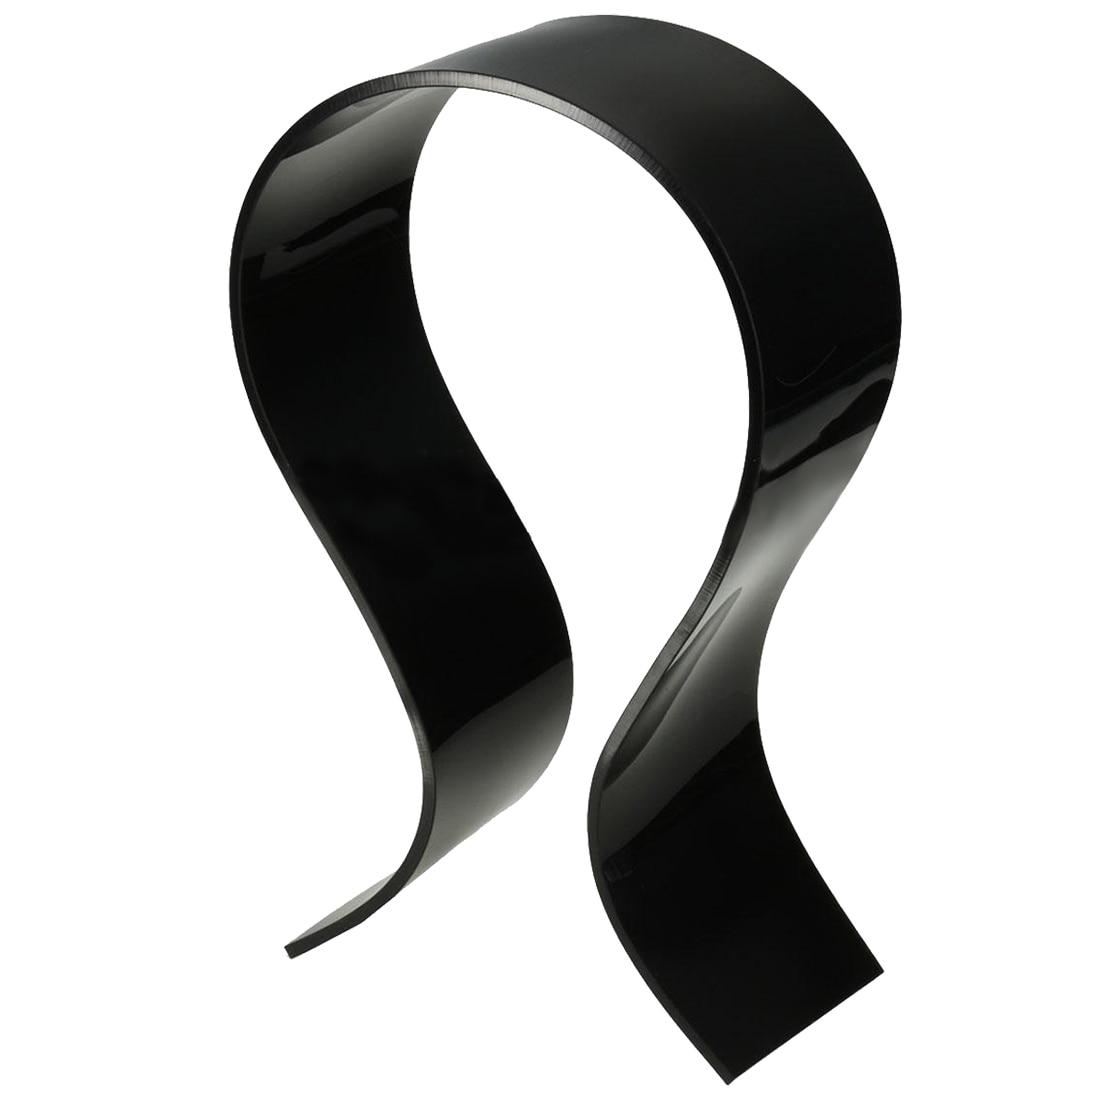 Acrylic U-type Headphone Headset Holder Desk Stand Display Hanger Rack Shelf, Black